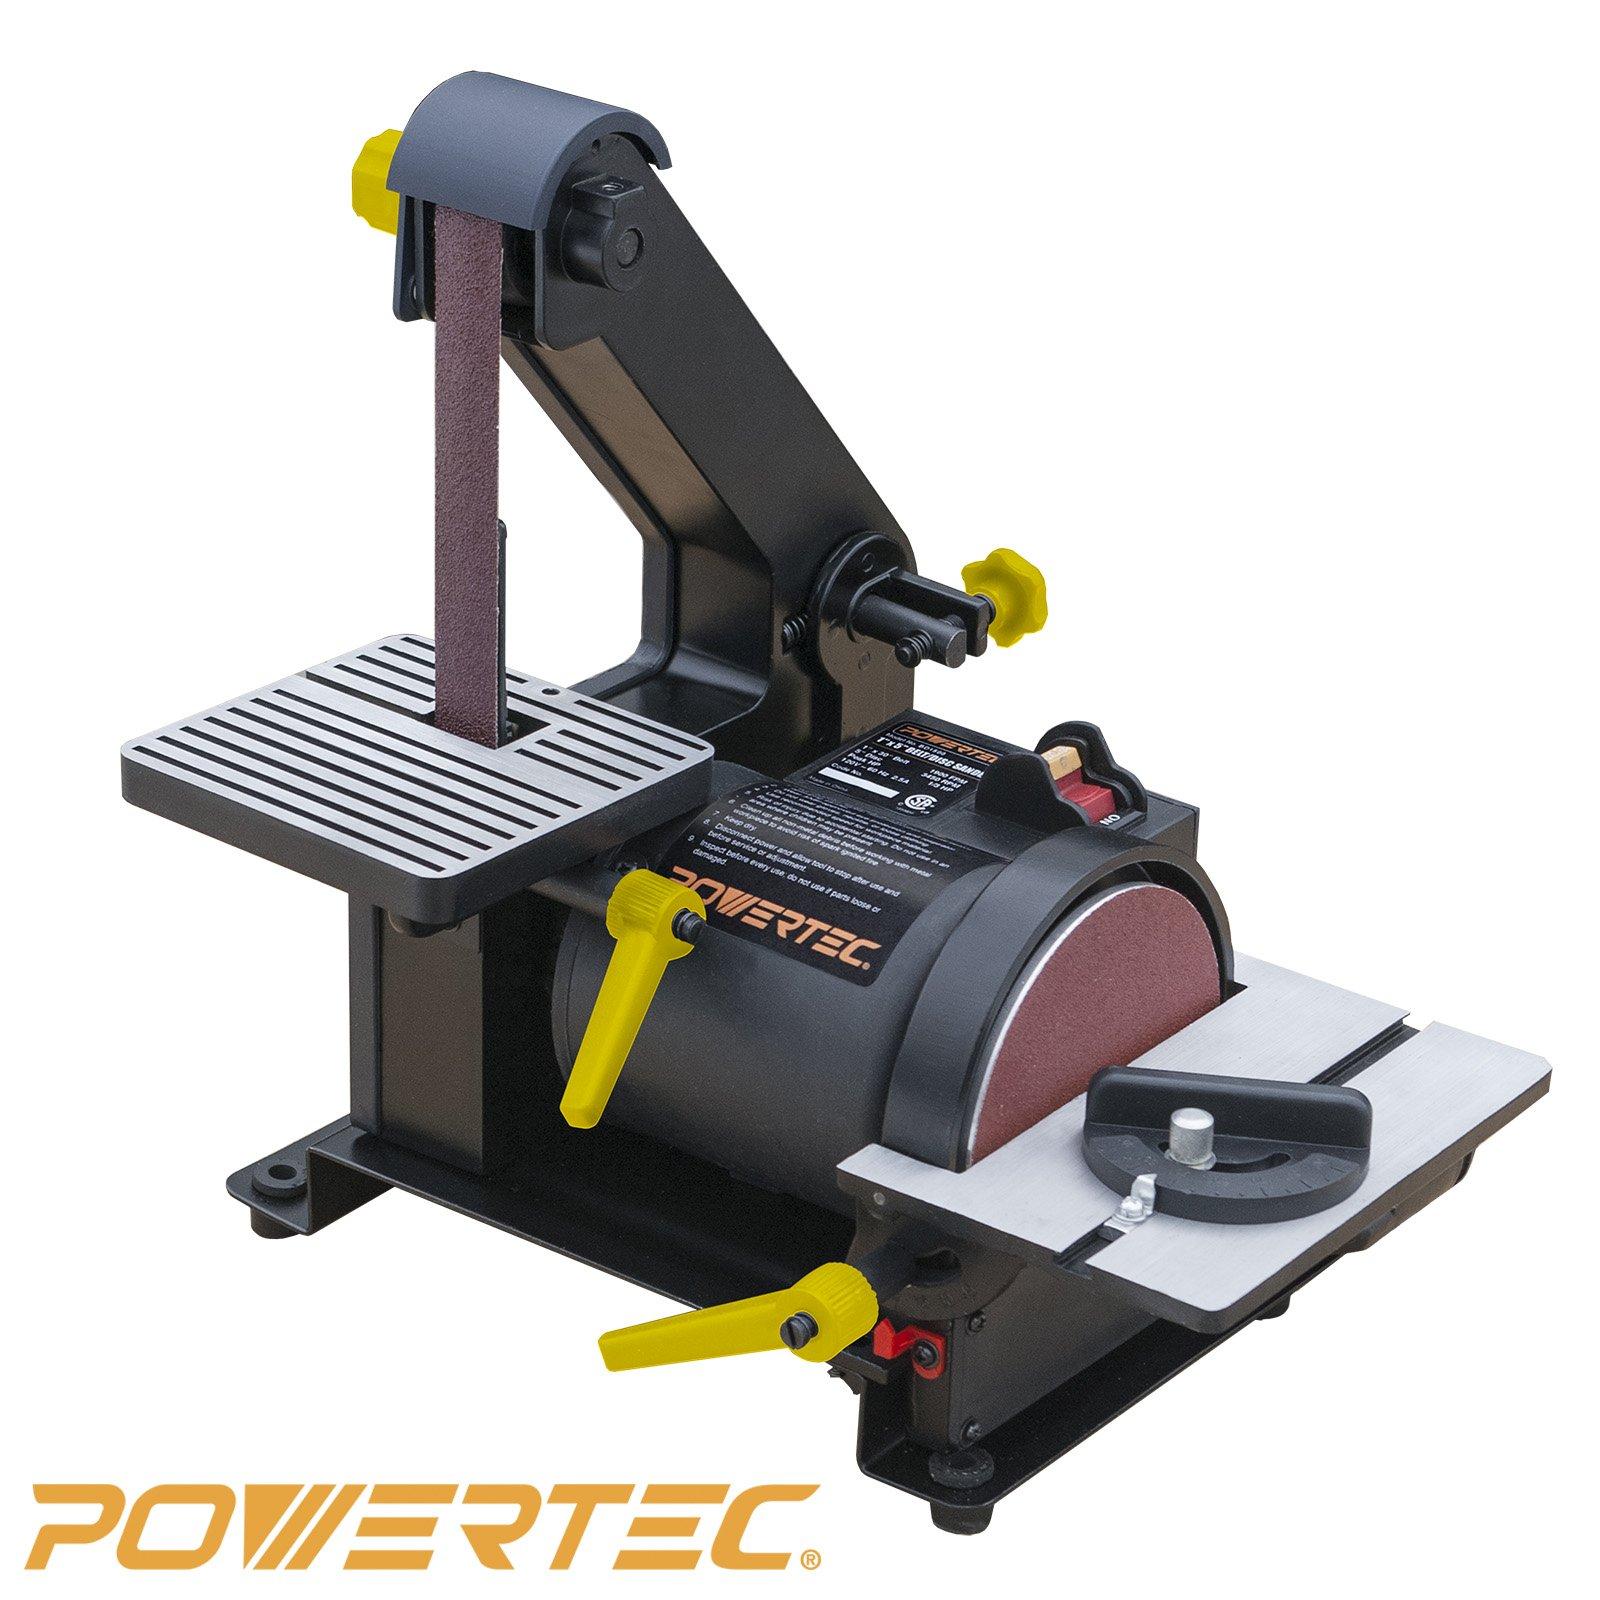 POWERTEC BD1500 Belt Disc Sander for Woodworking | 1 in. x 30 in. Belt Sander with 5 in. Sanding Disc by POWERTEC